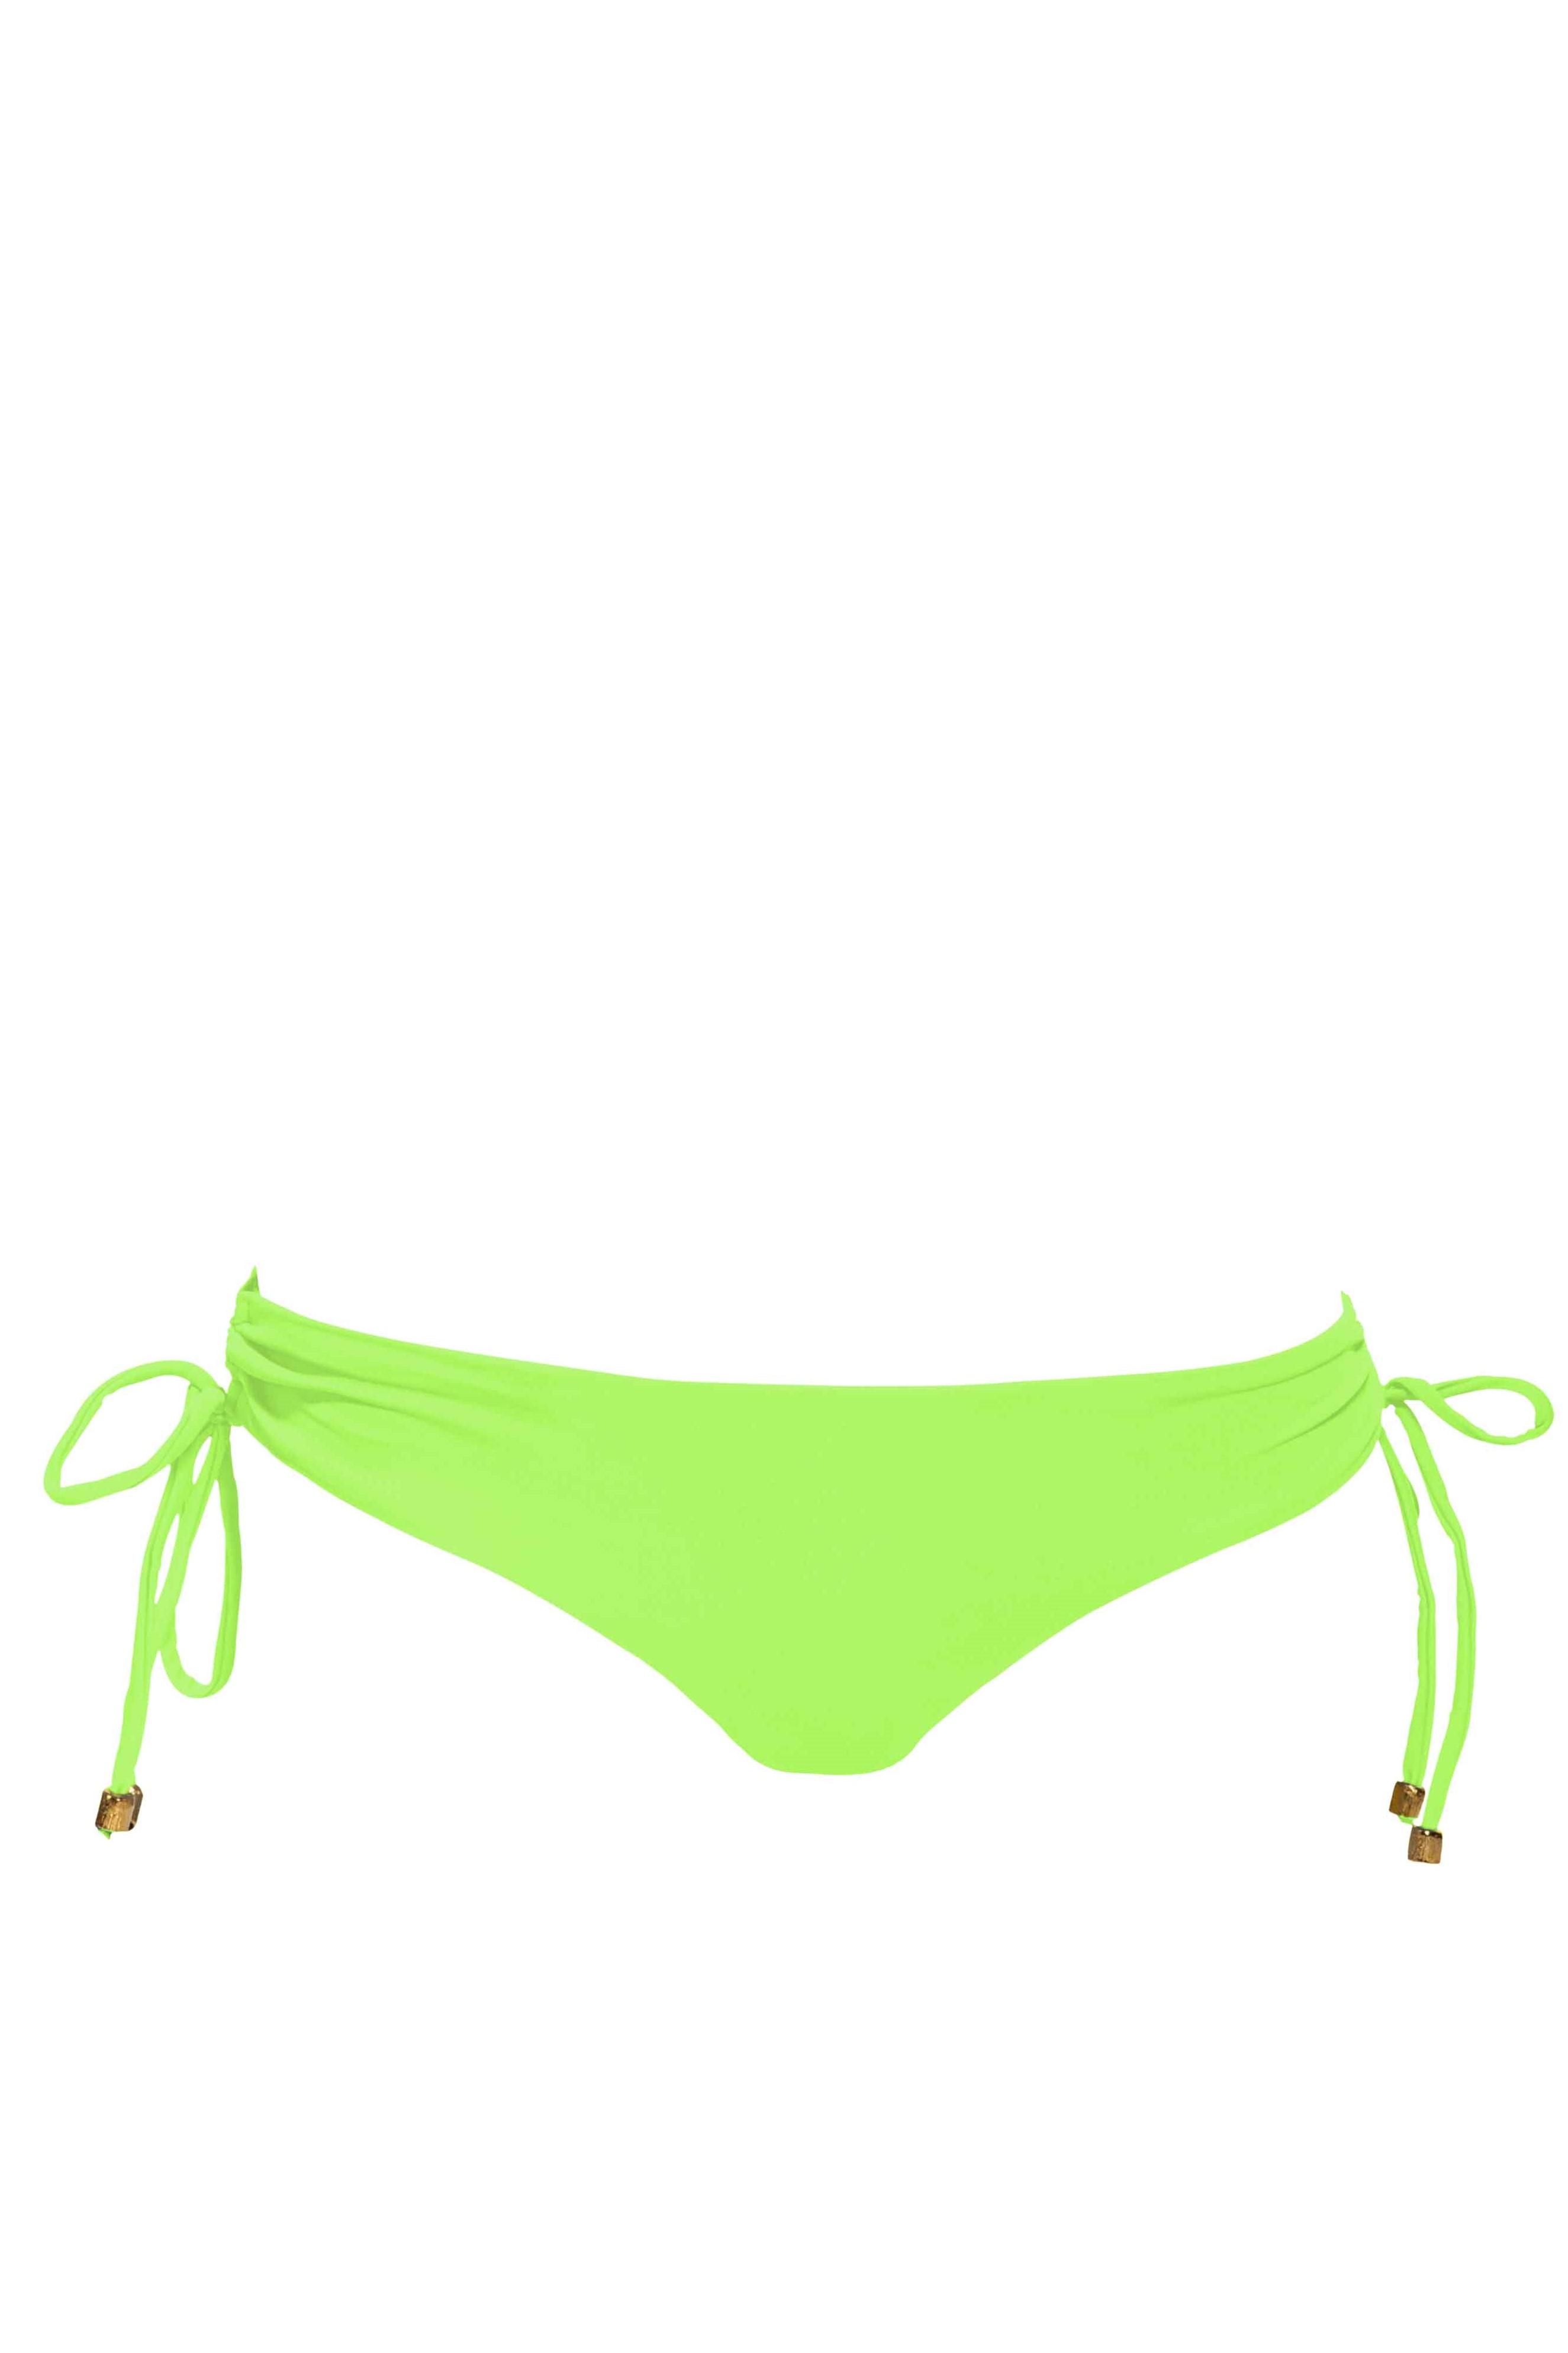 Phax Color Mix Cheeky Bikini Bas Vert Fluo